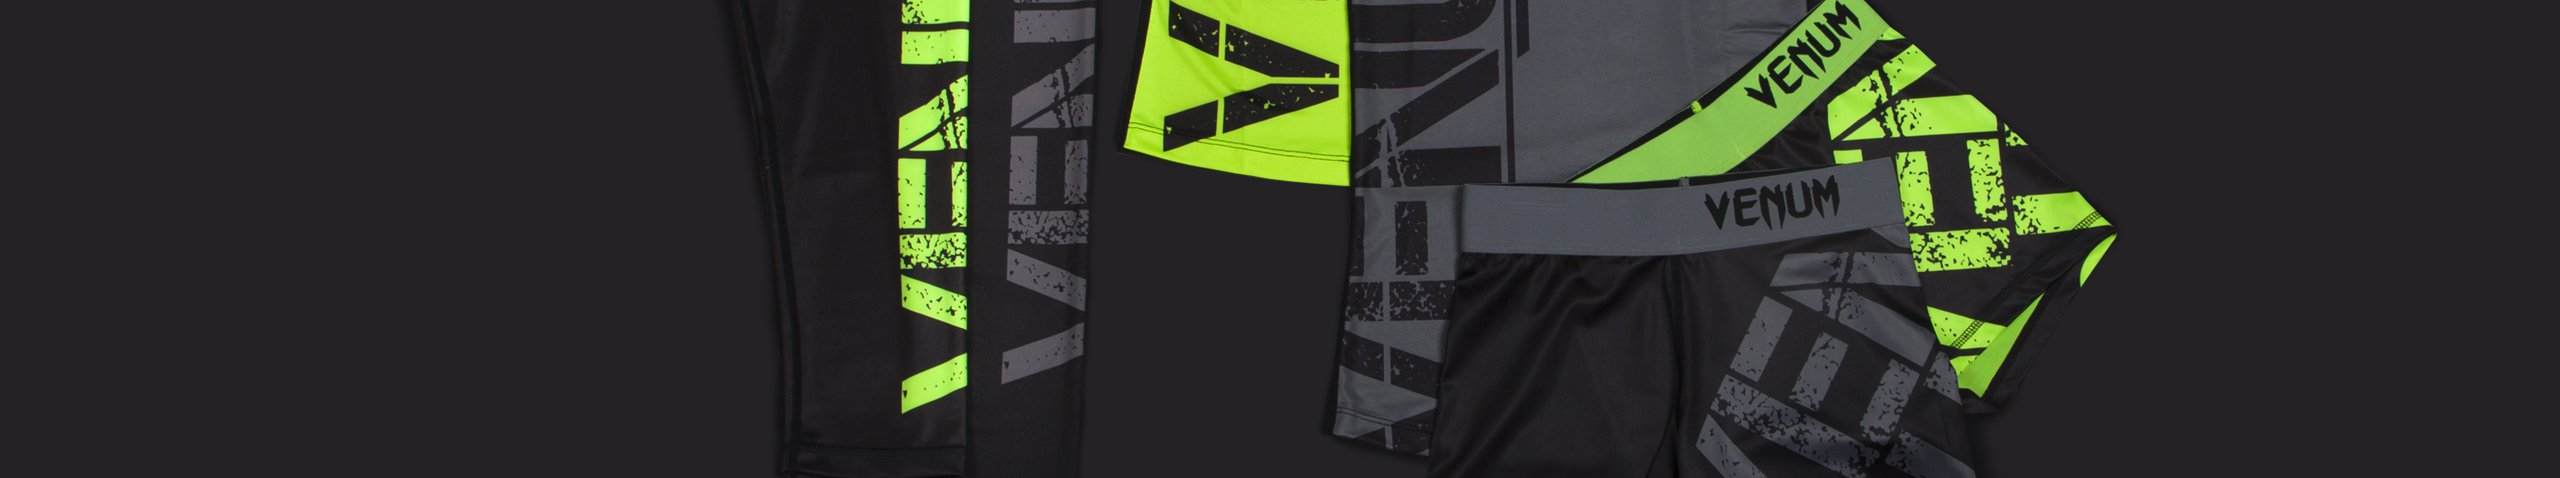 Women's shorts : all Venum shorts for women | Venum.com Asia